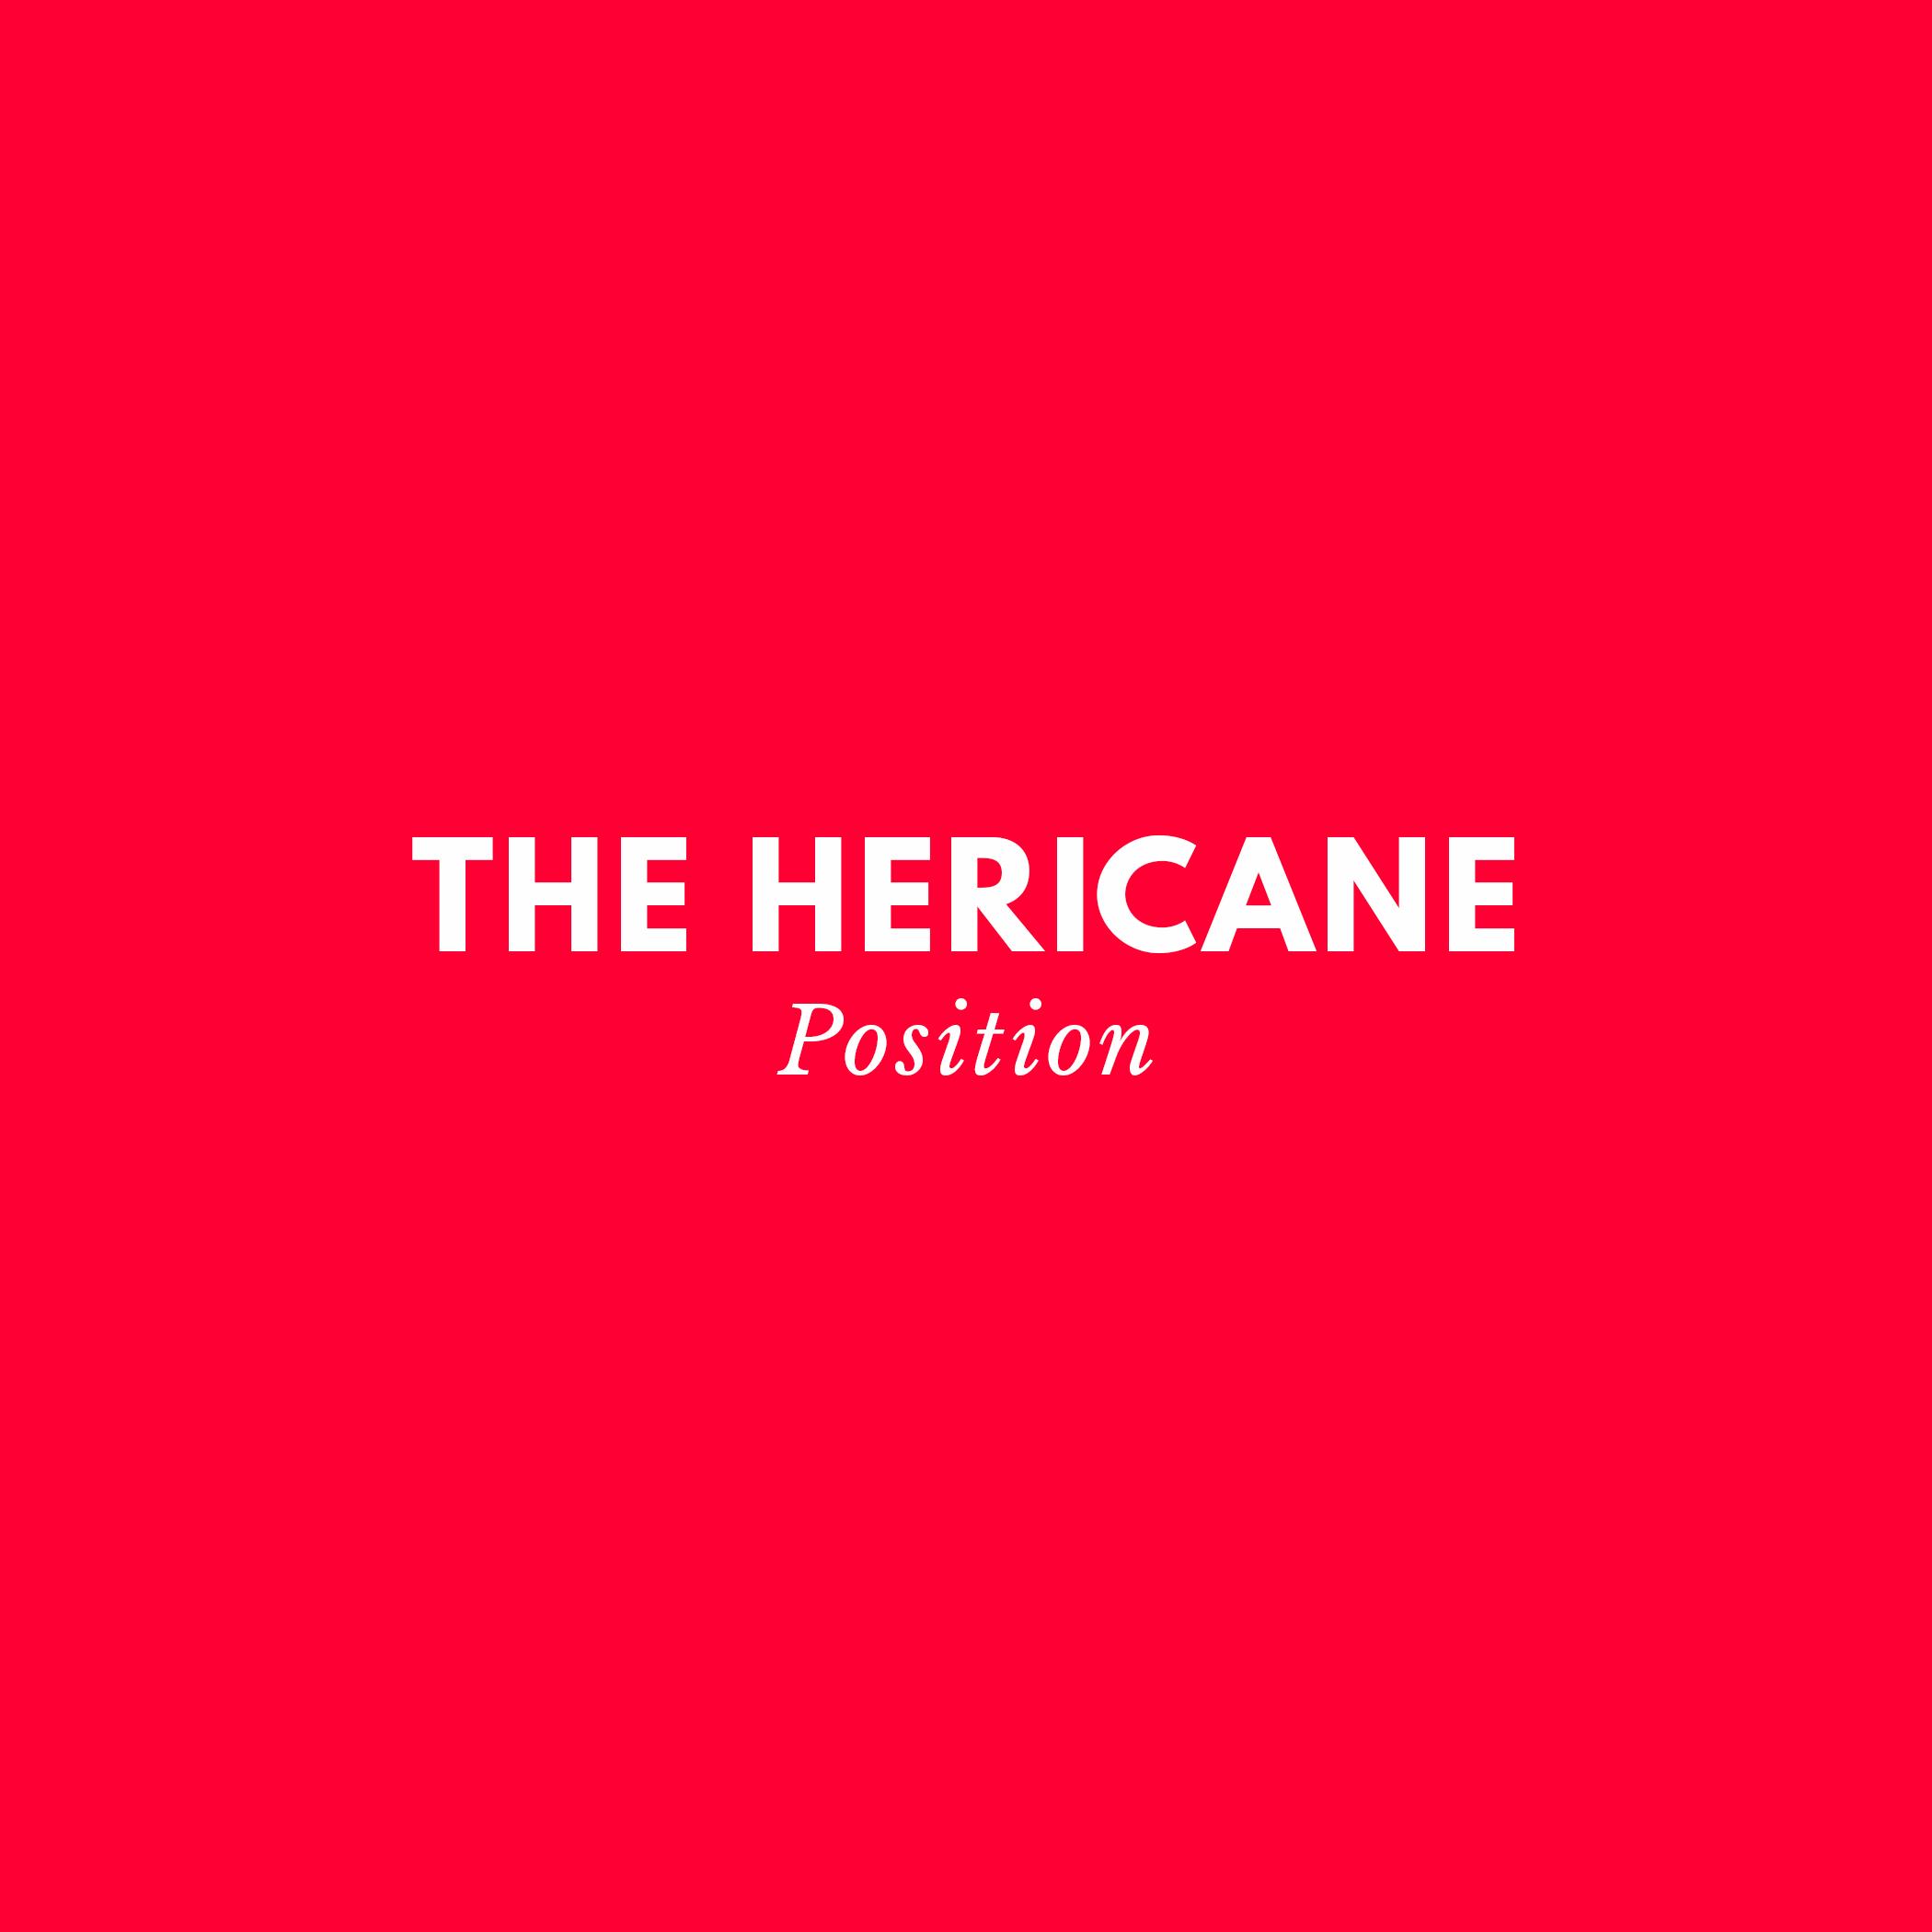 Hericane-Title.jpg